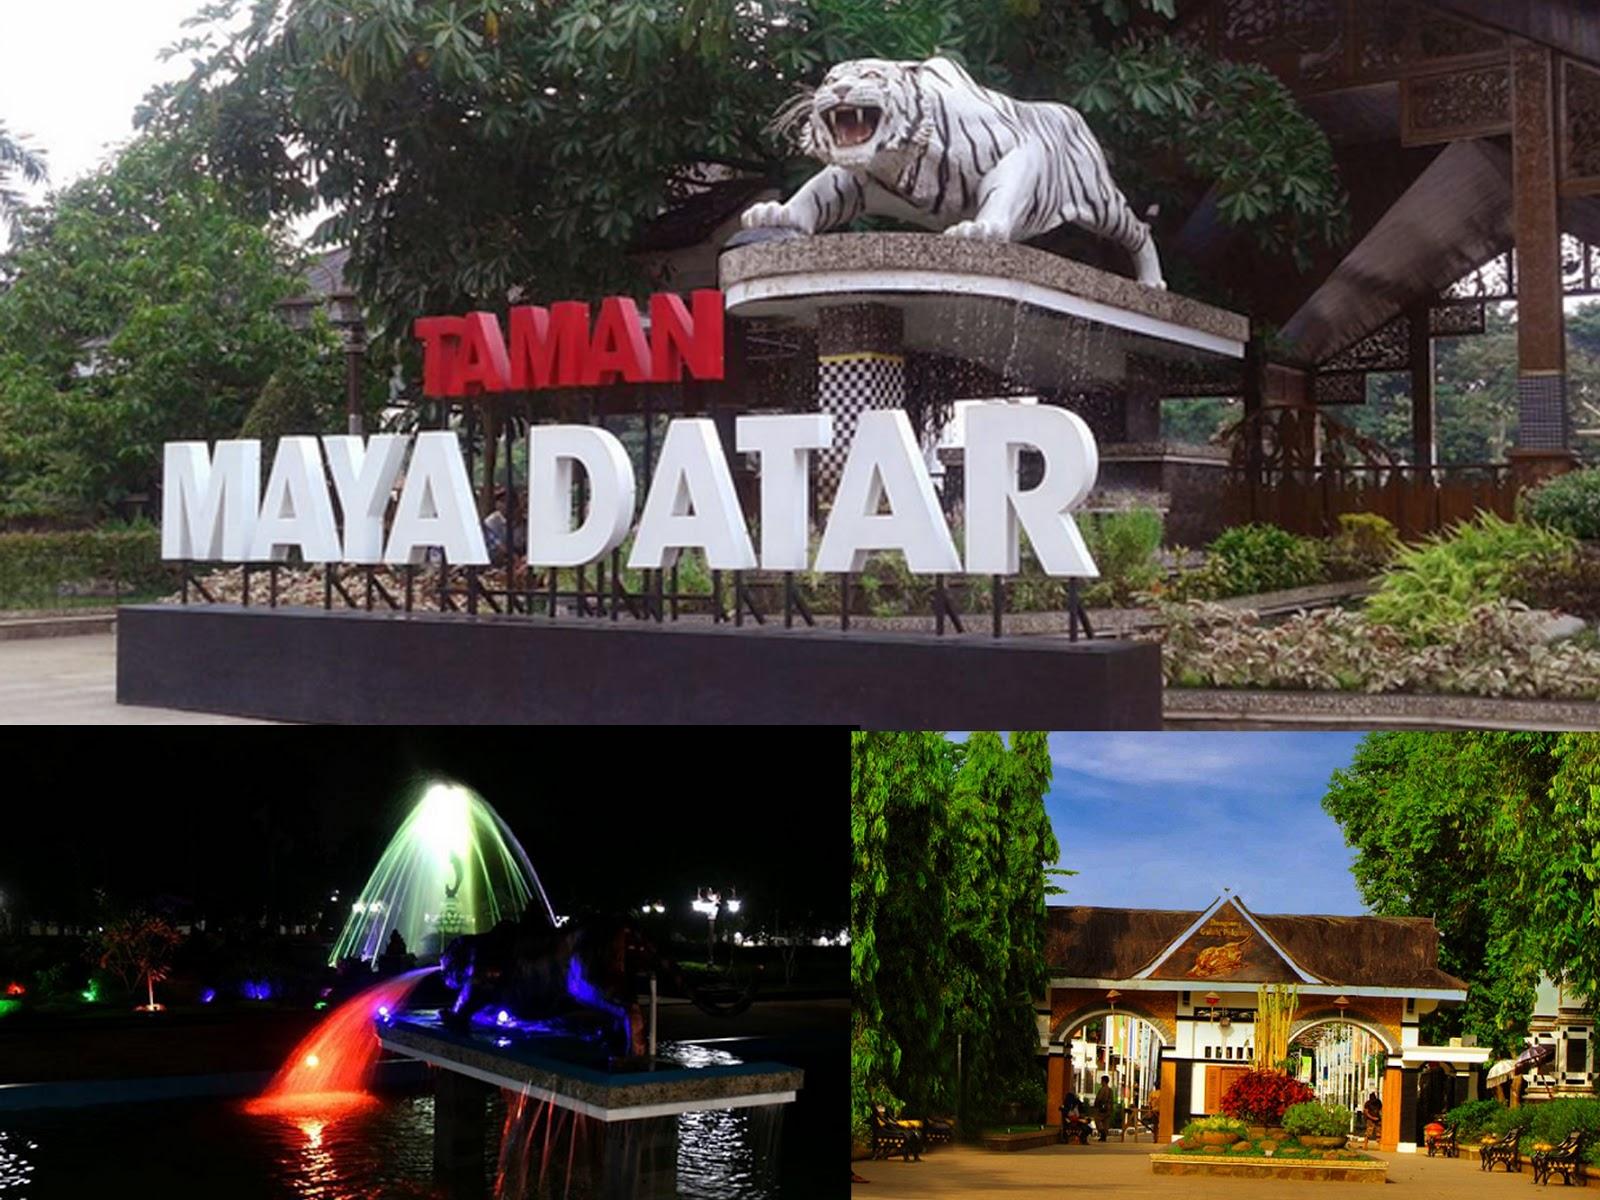 Pesanggrahan Pajajaran Taman Maya Datar Purwakarta